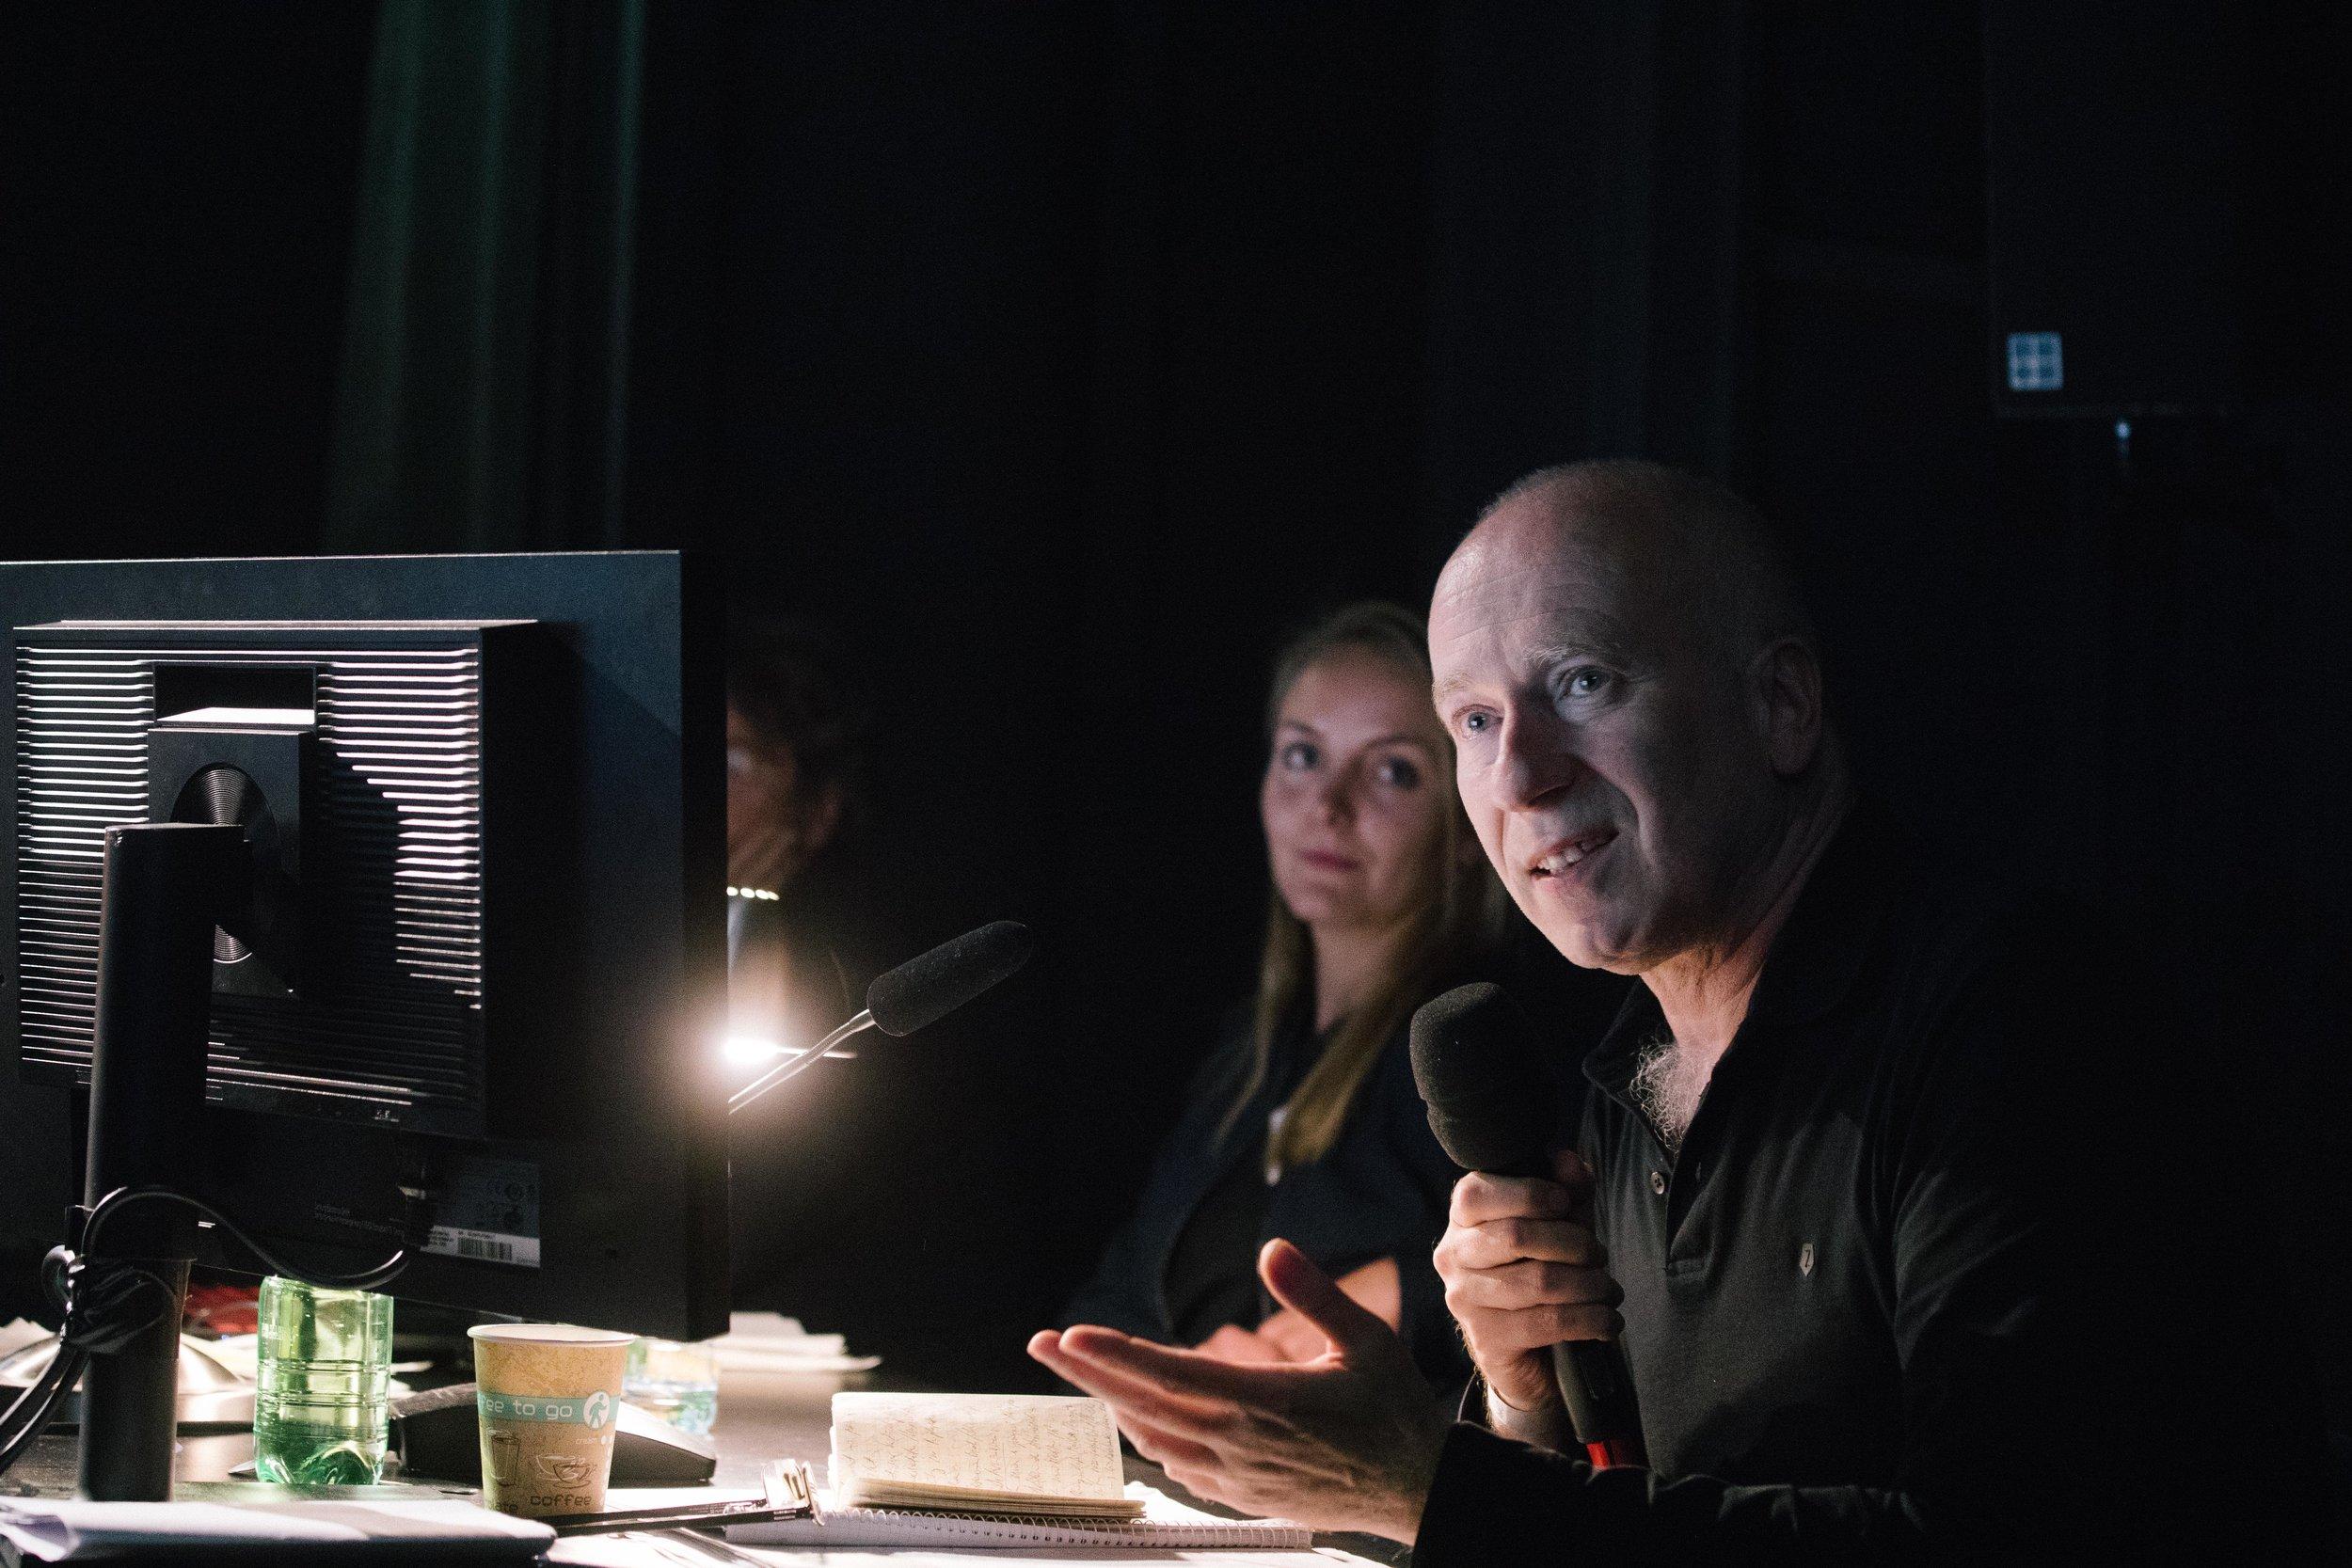 Joseph Vogl at the critics table © Eike Walkenhorst